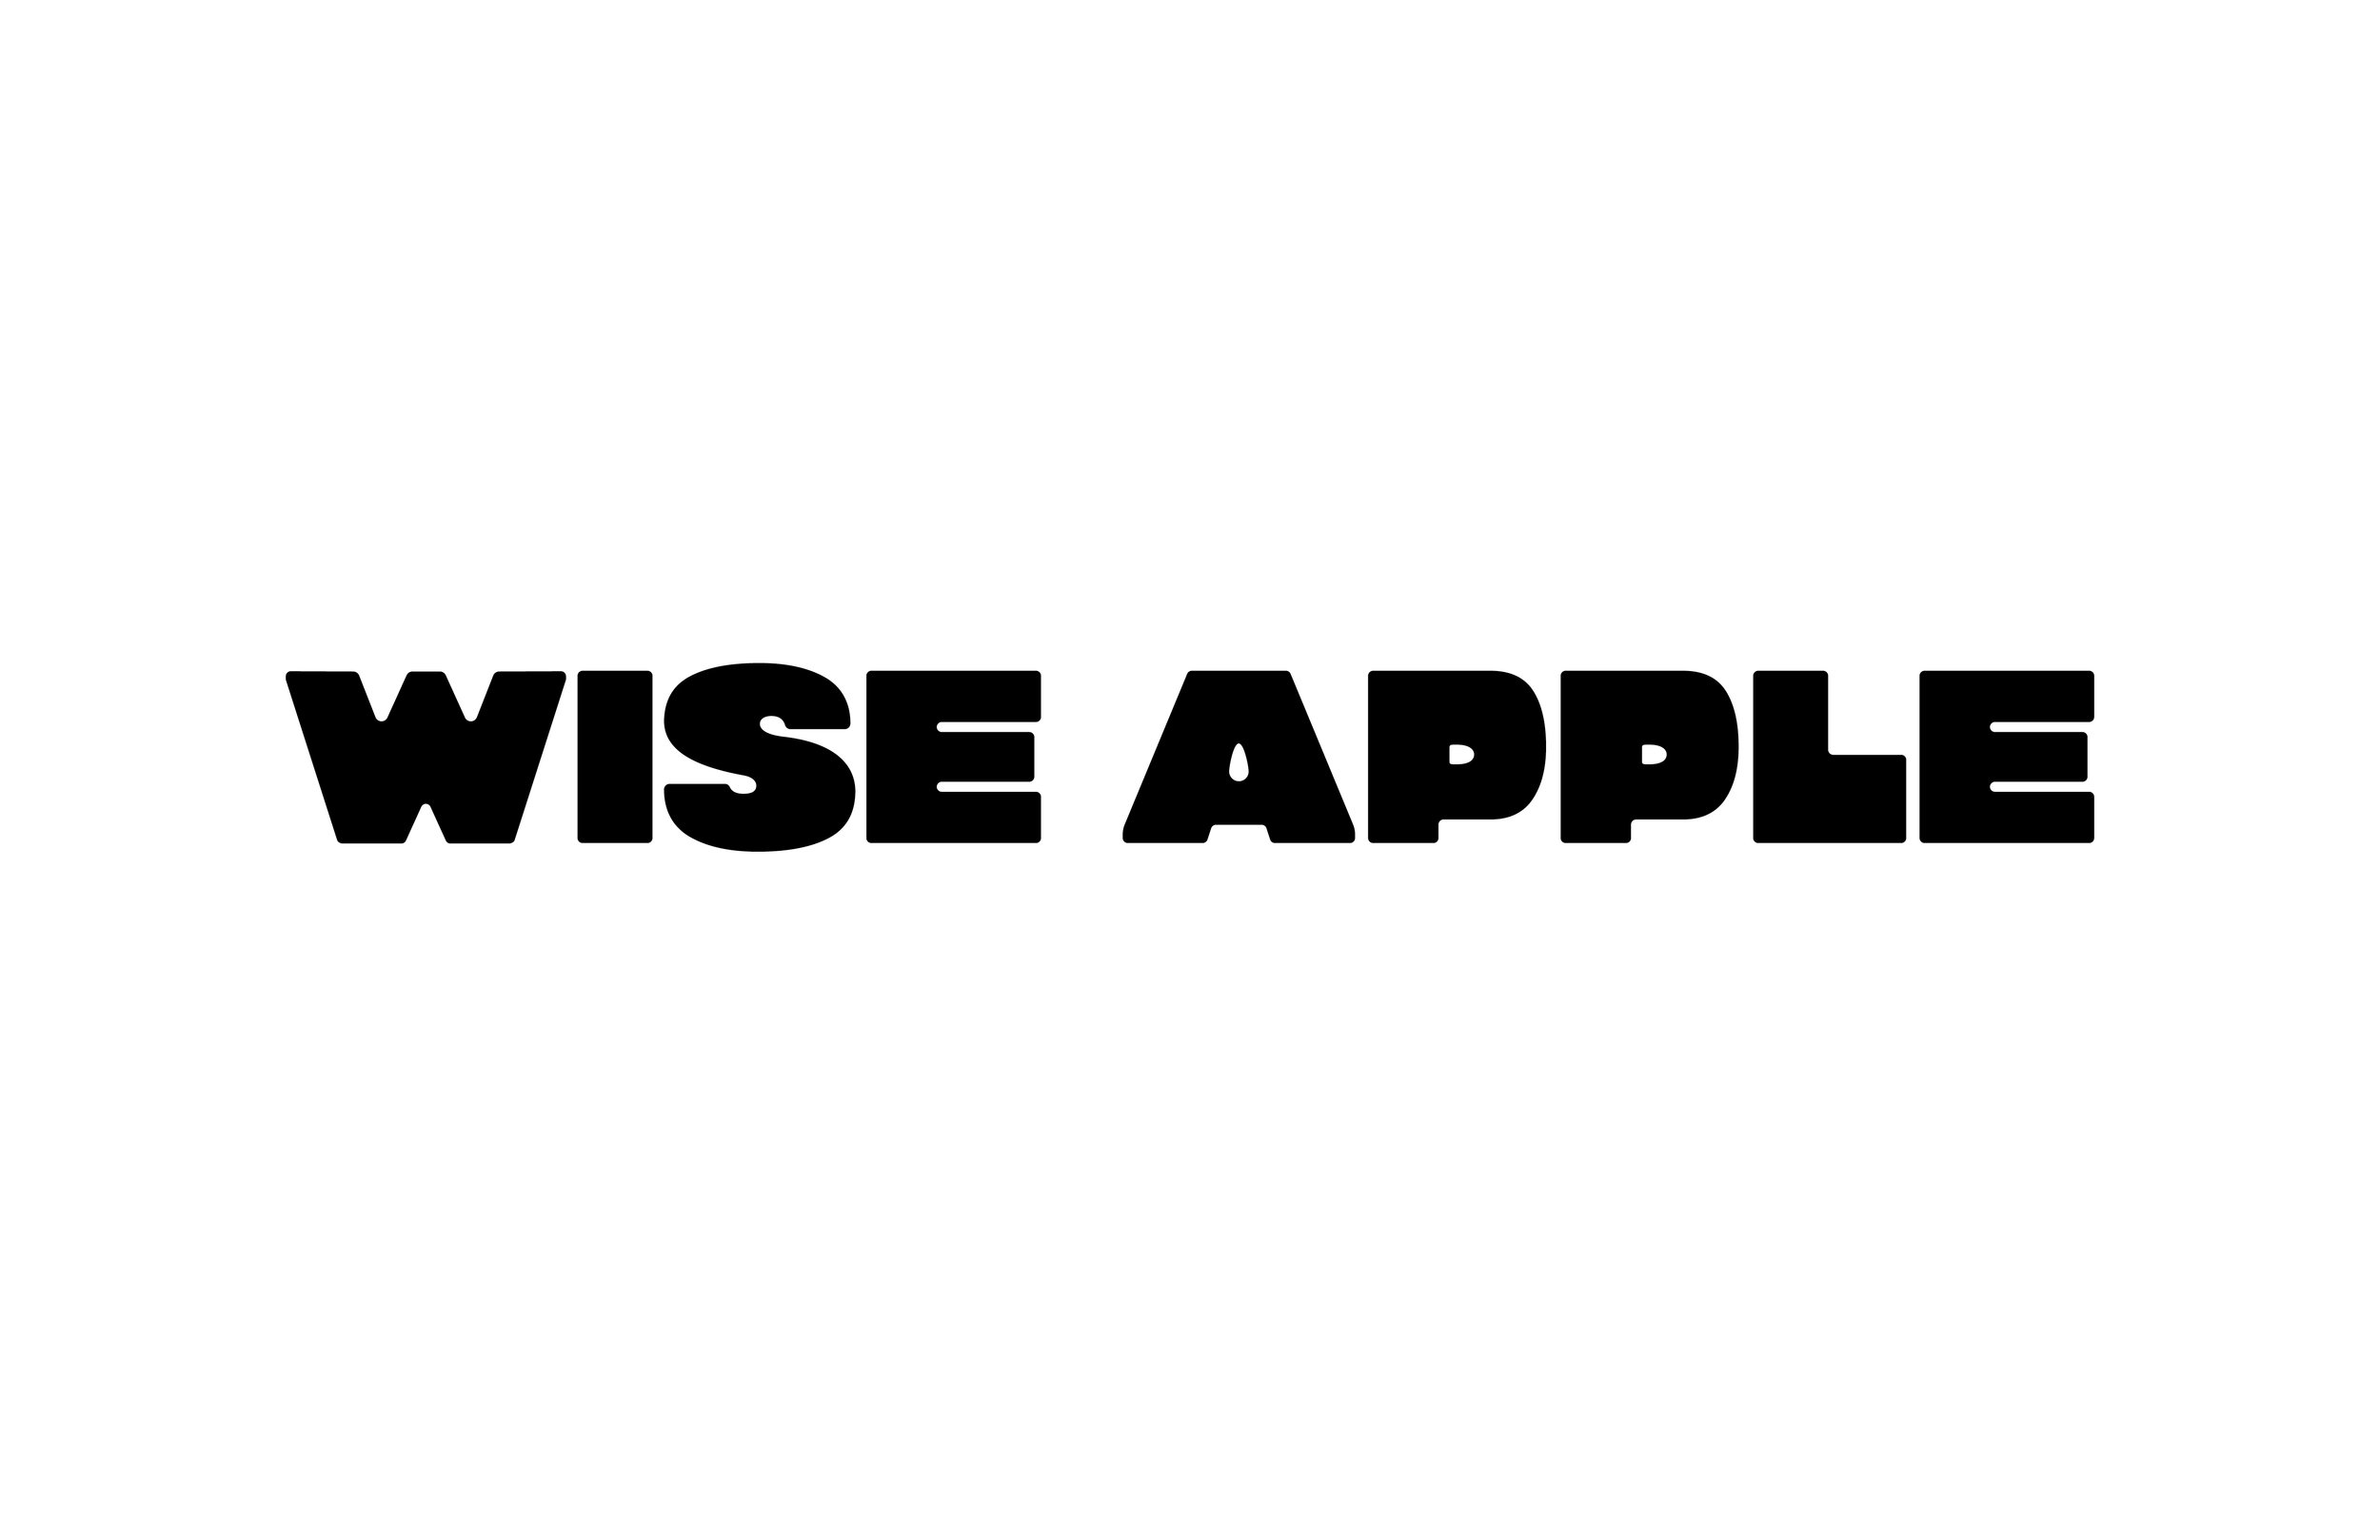 WiseApple_02.jpg